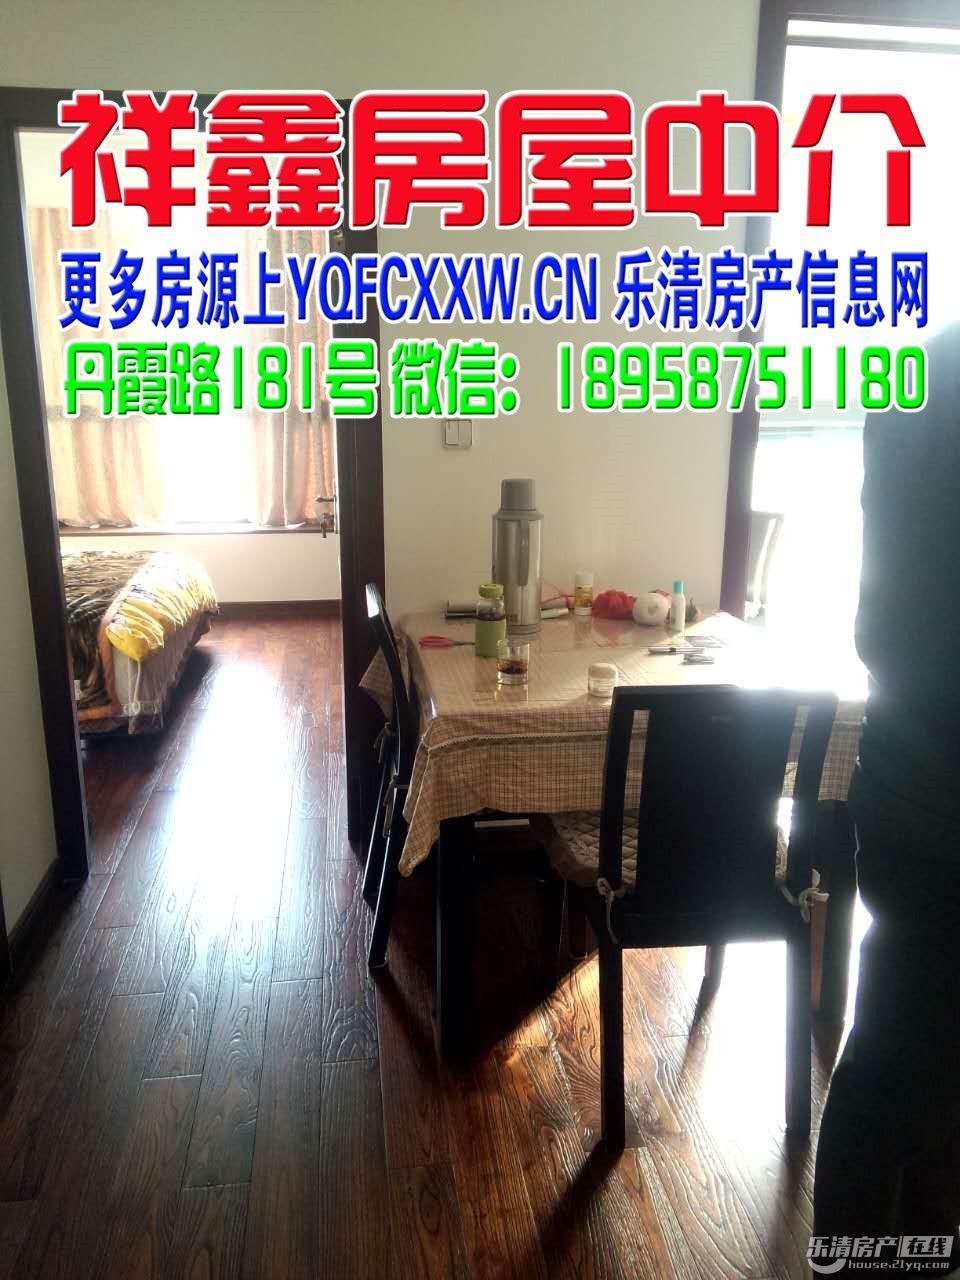 http://house.21yq.com/userfiles/image/20160630/301411502b059621c20718.jpg